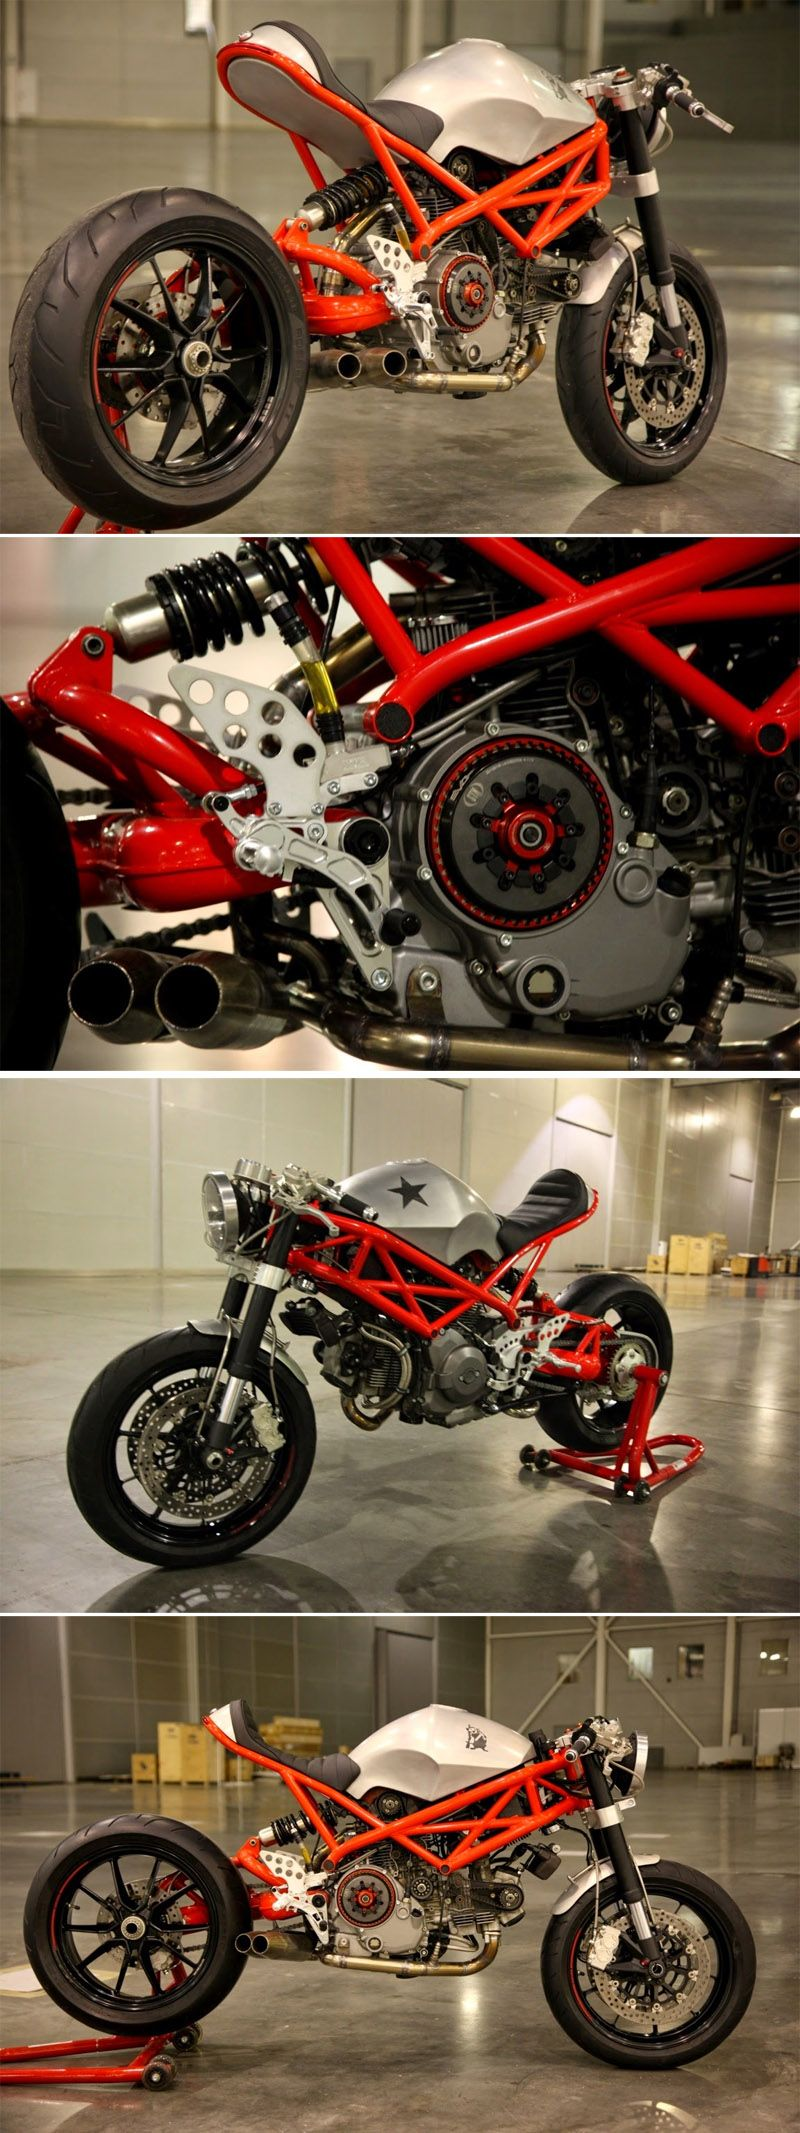 Baixar fotos de motos 1100